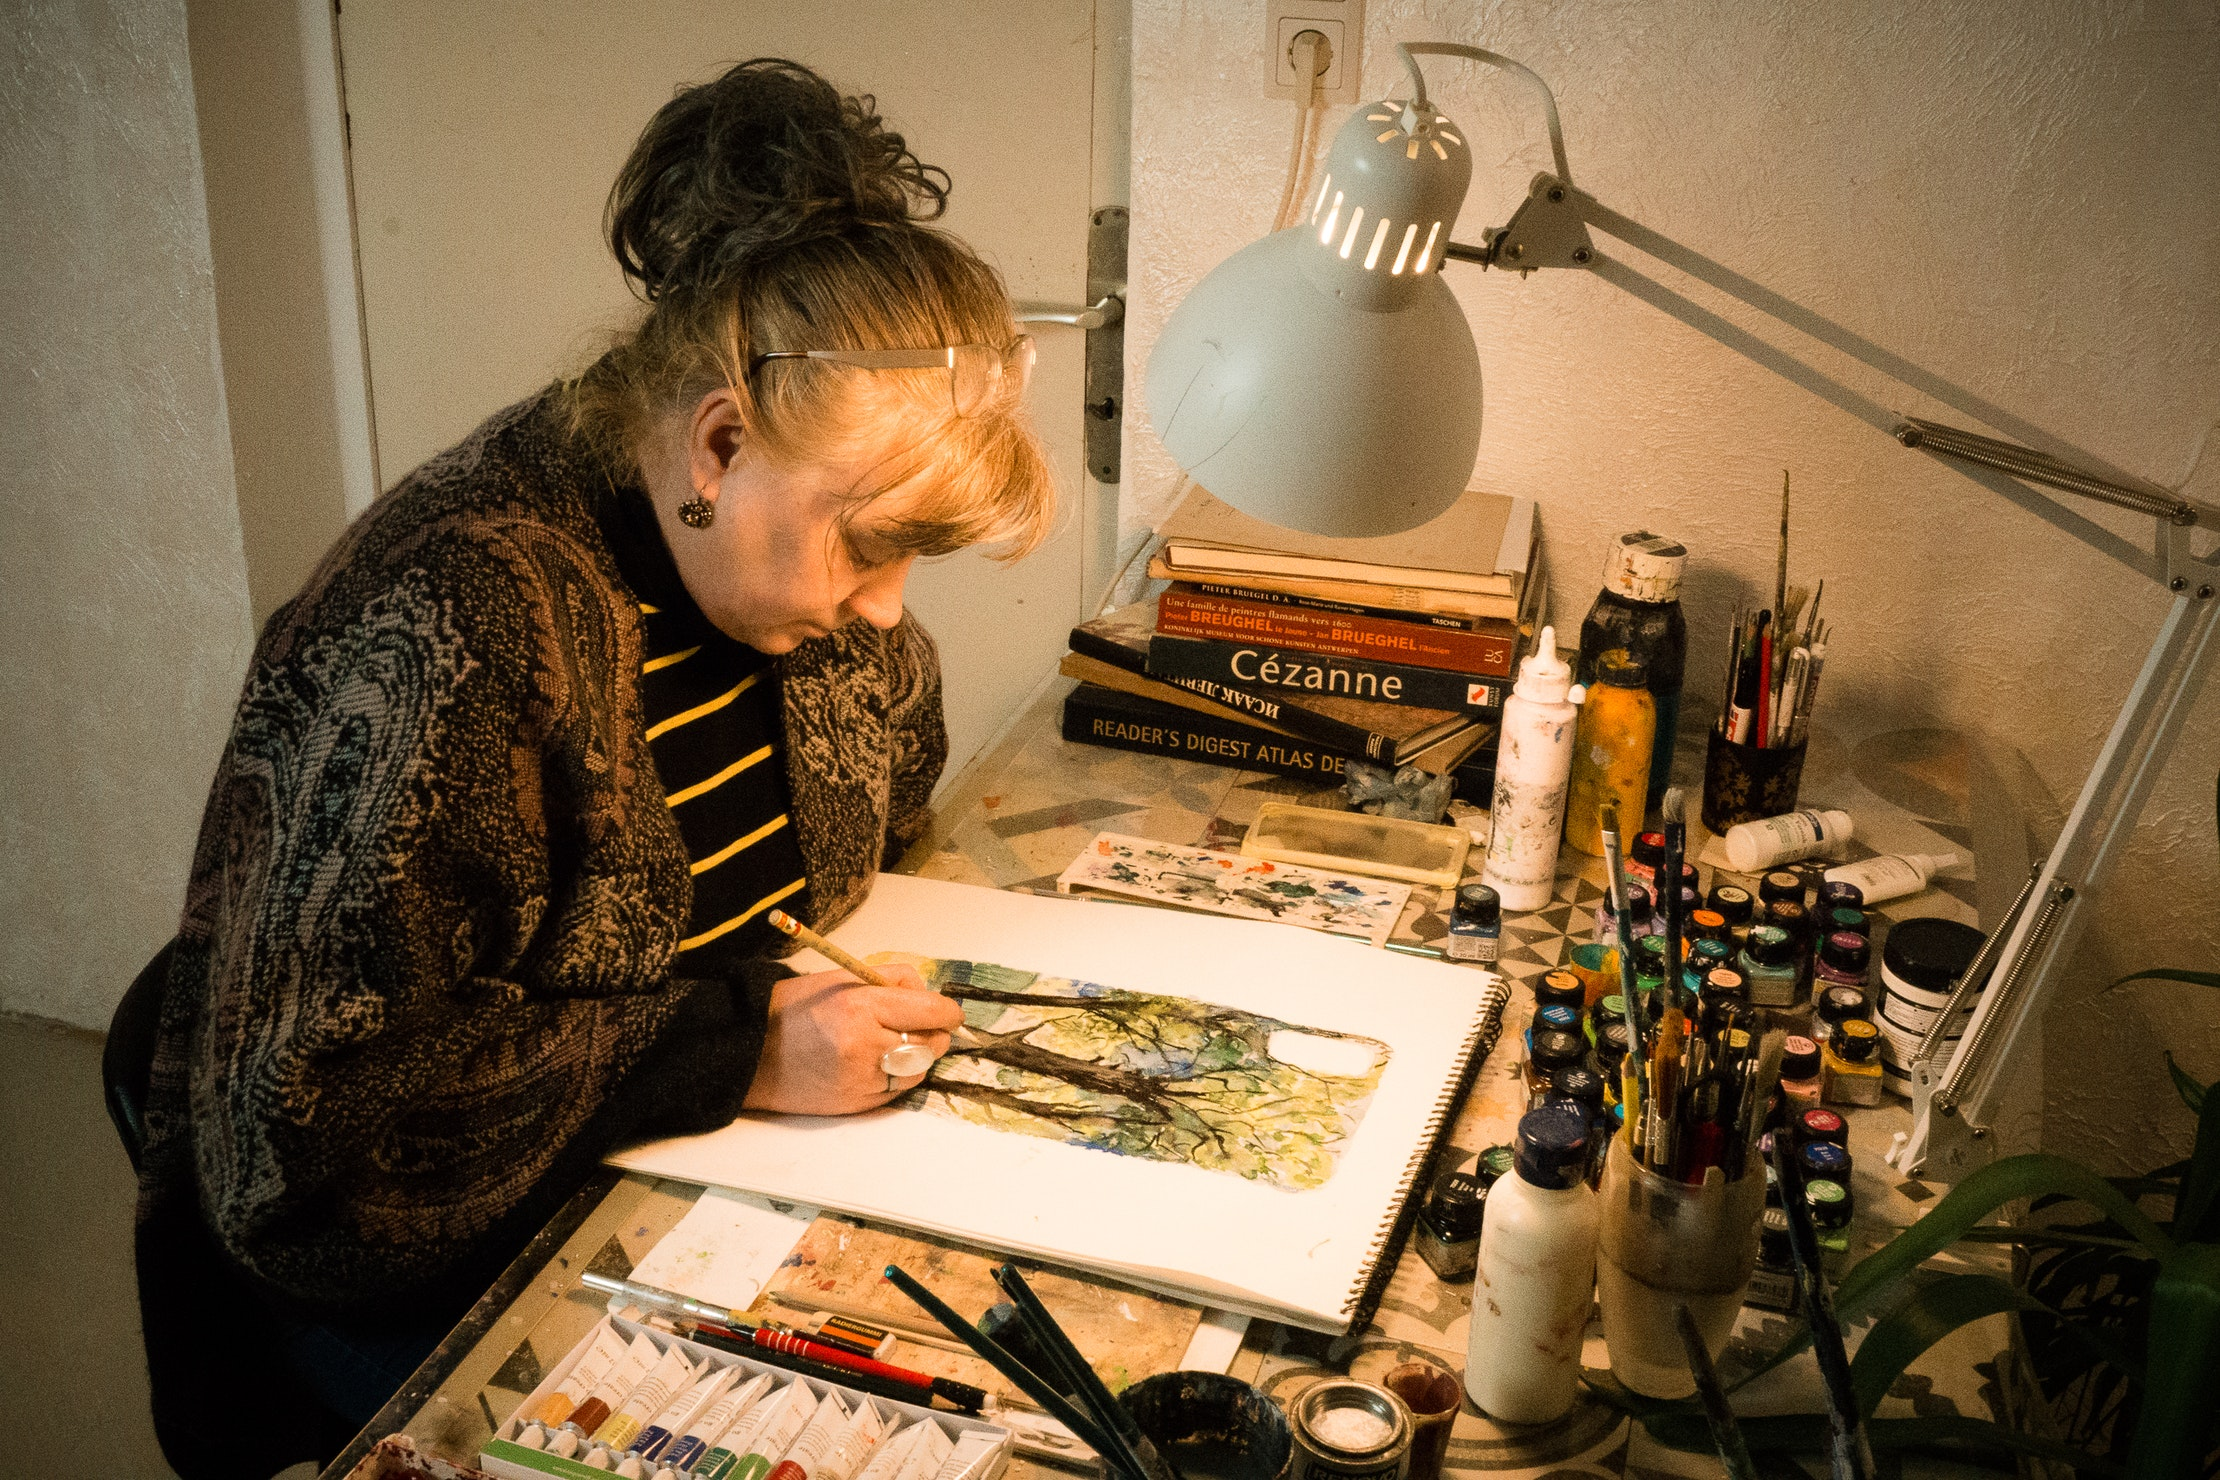 Elena Birkenwald sketching a draft.